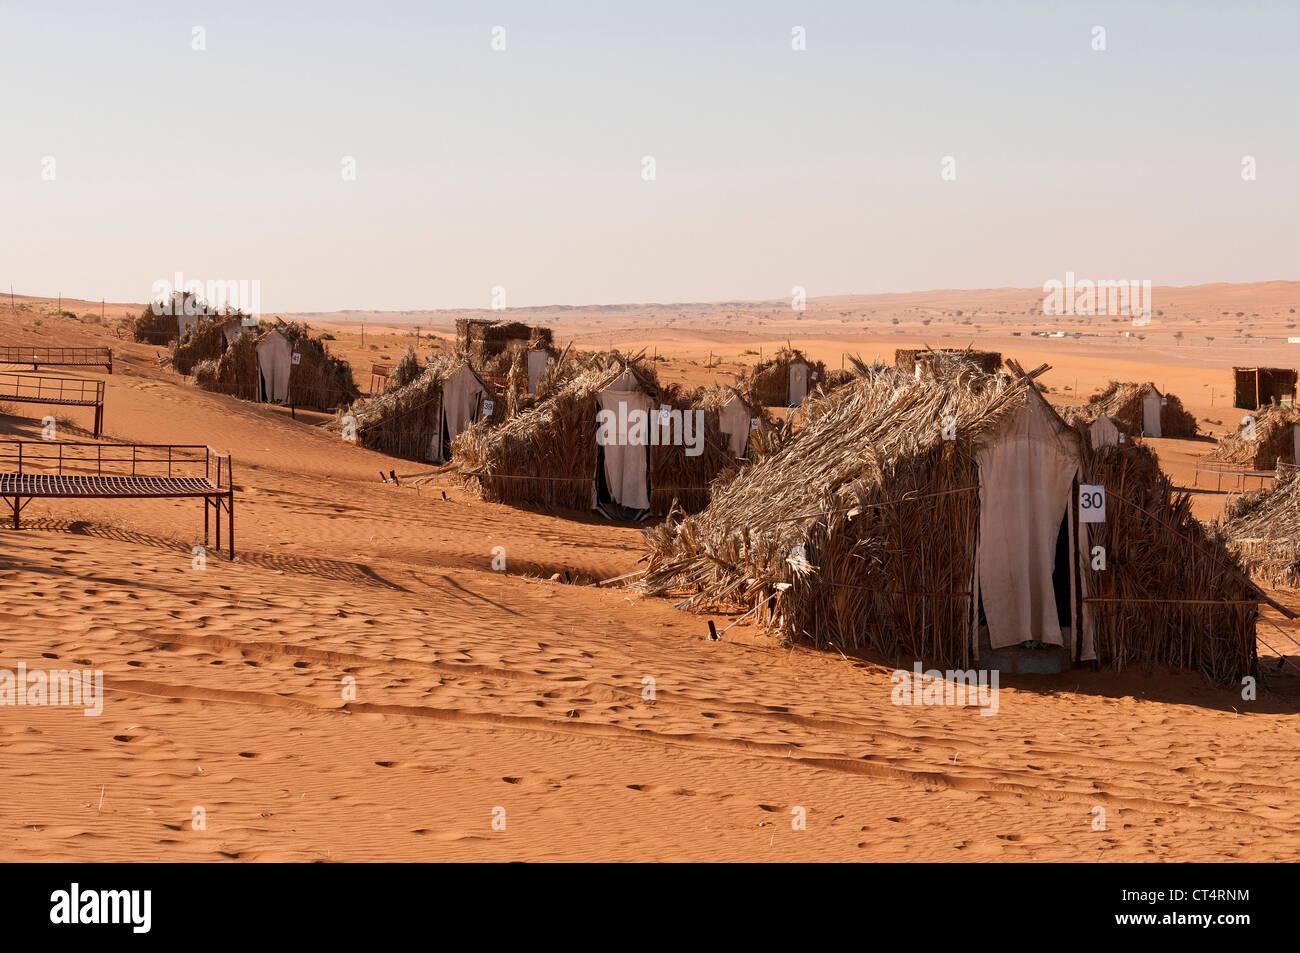 Omán, Wahibah Elk207-2142 (Sharqiya) Sands, al campamento Areesh Imagen De Stock